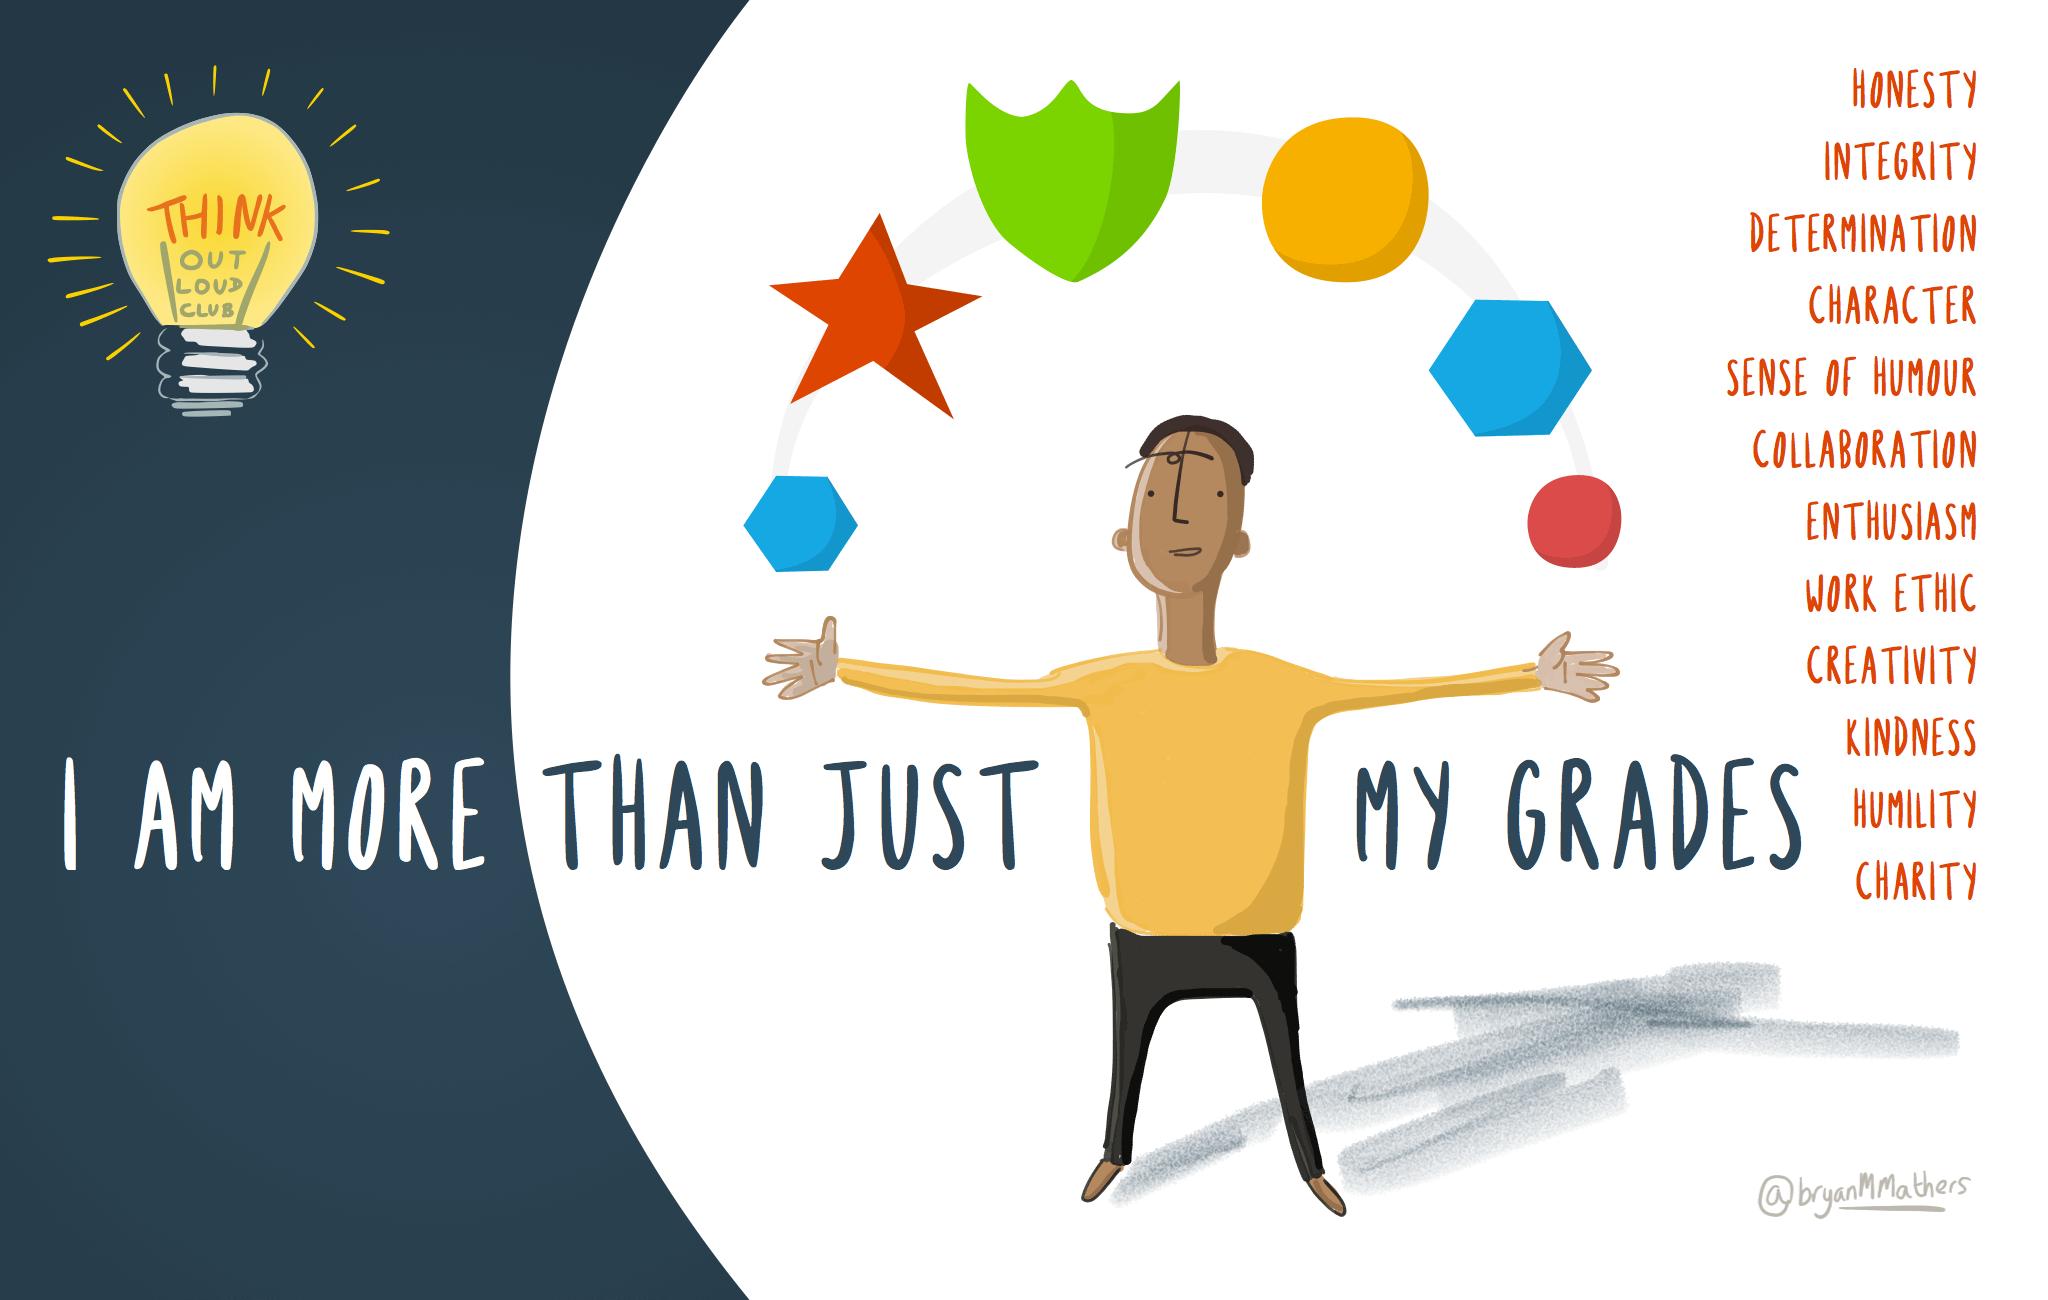 I am more than just my grades